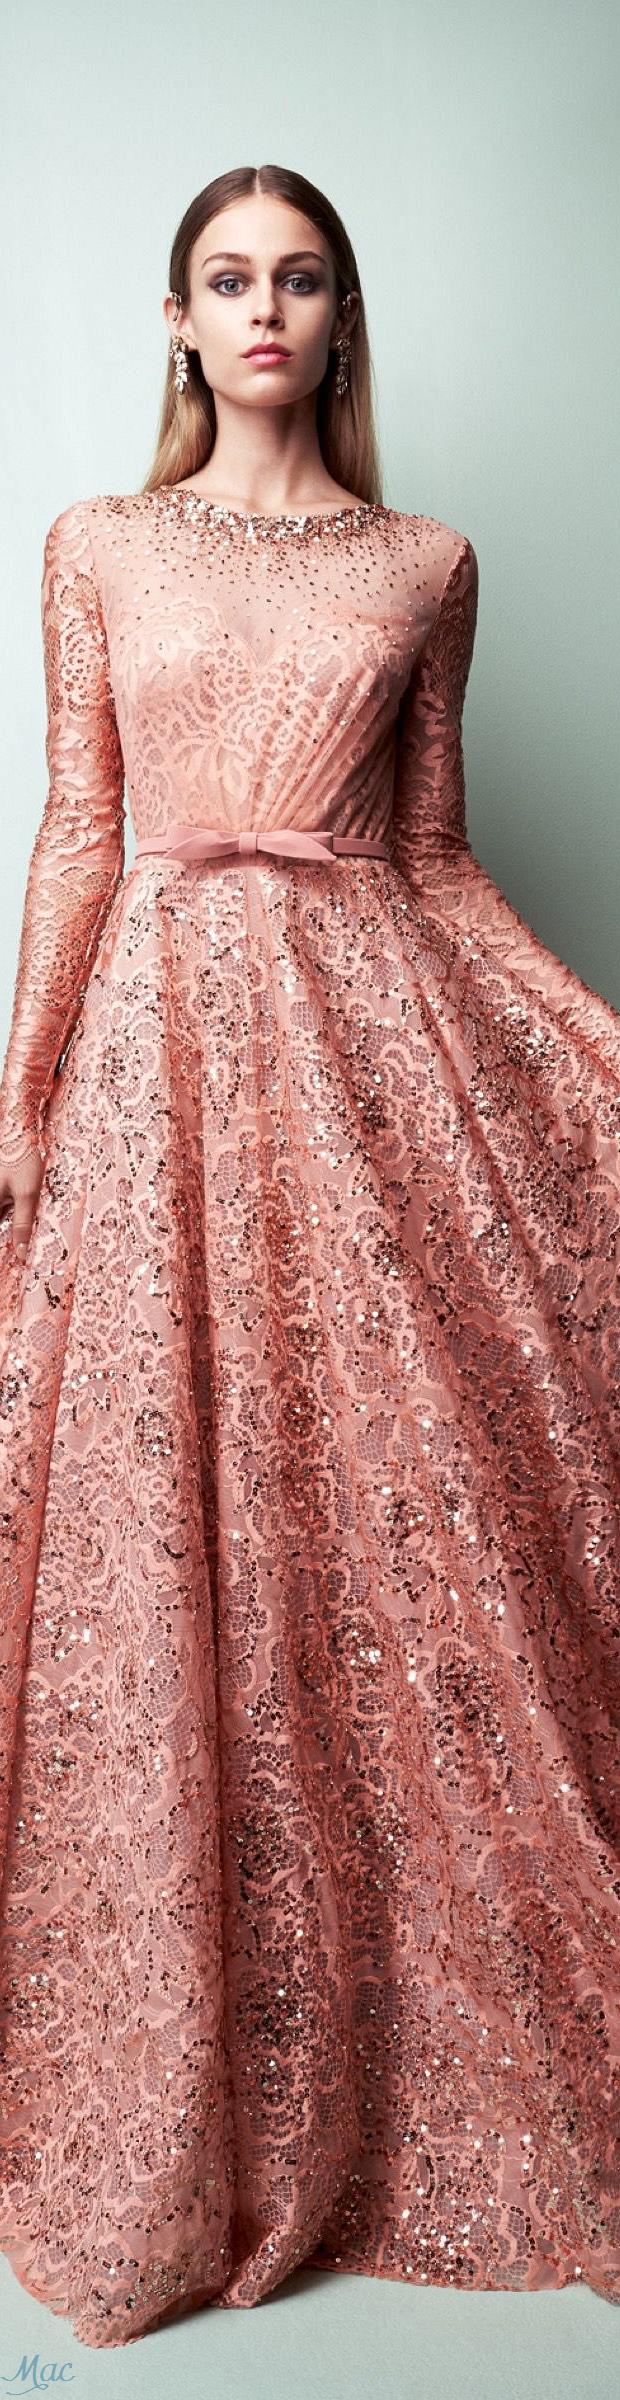 Spring 2017 Ready-to-Wear Georges Hobeika | Style | Pinterest | Alta ...